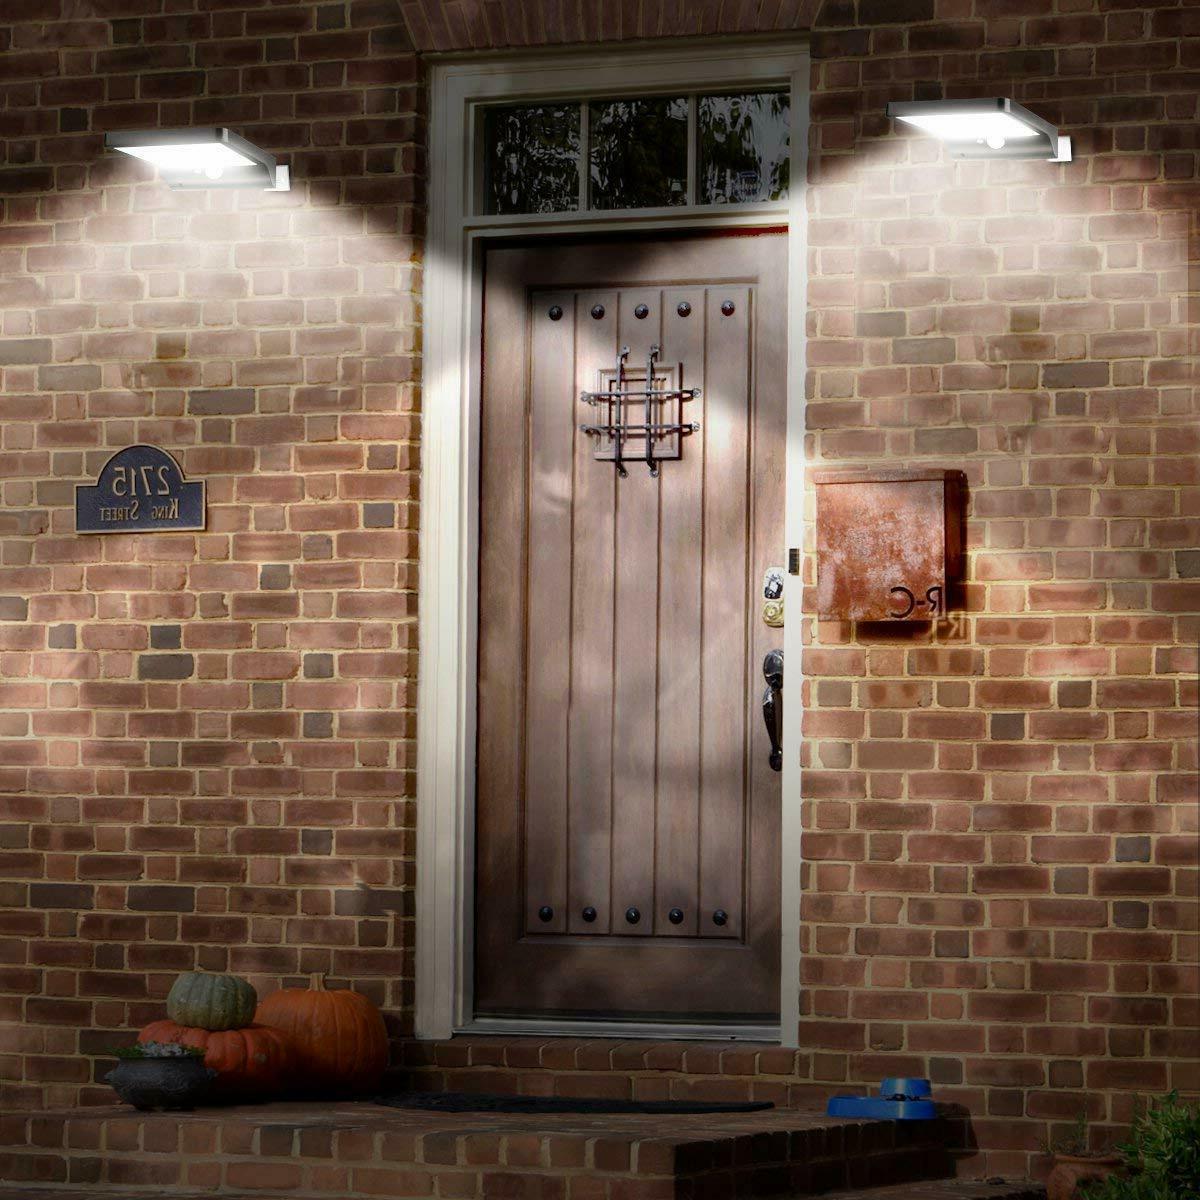 48 LED Outdoor Gutter Wall Solar Motion Sensor Light Remote